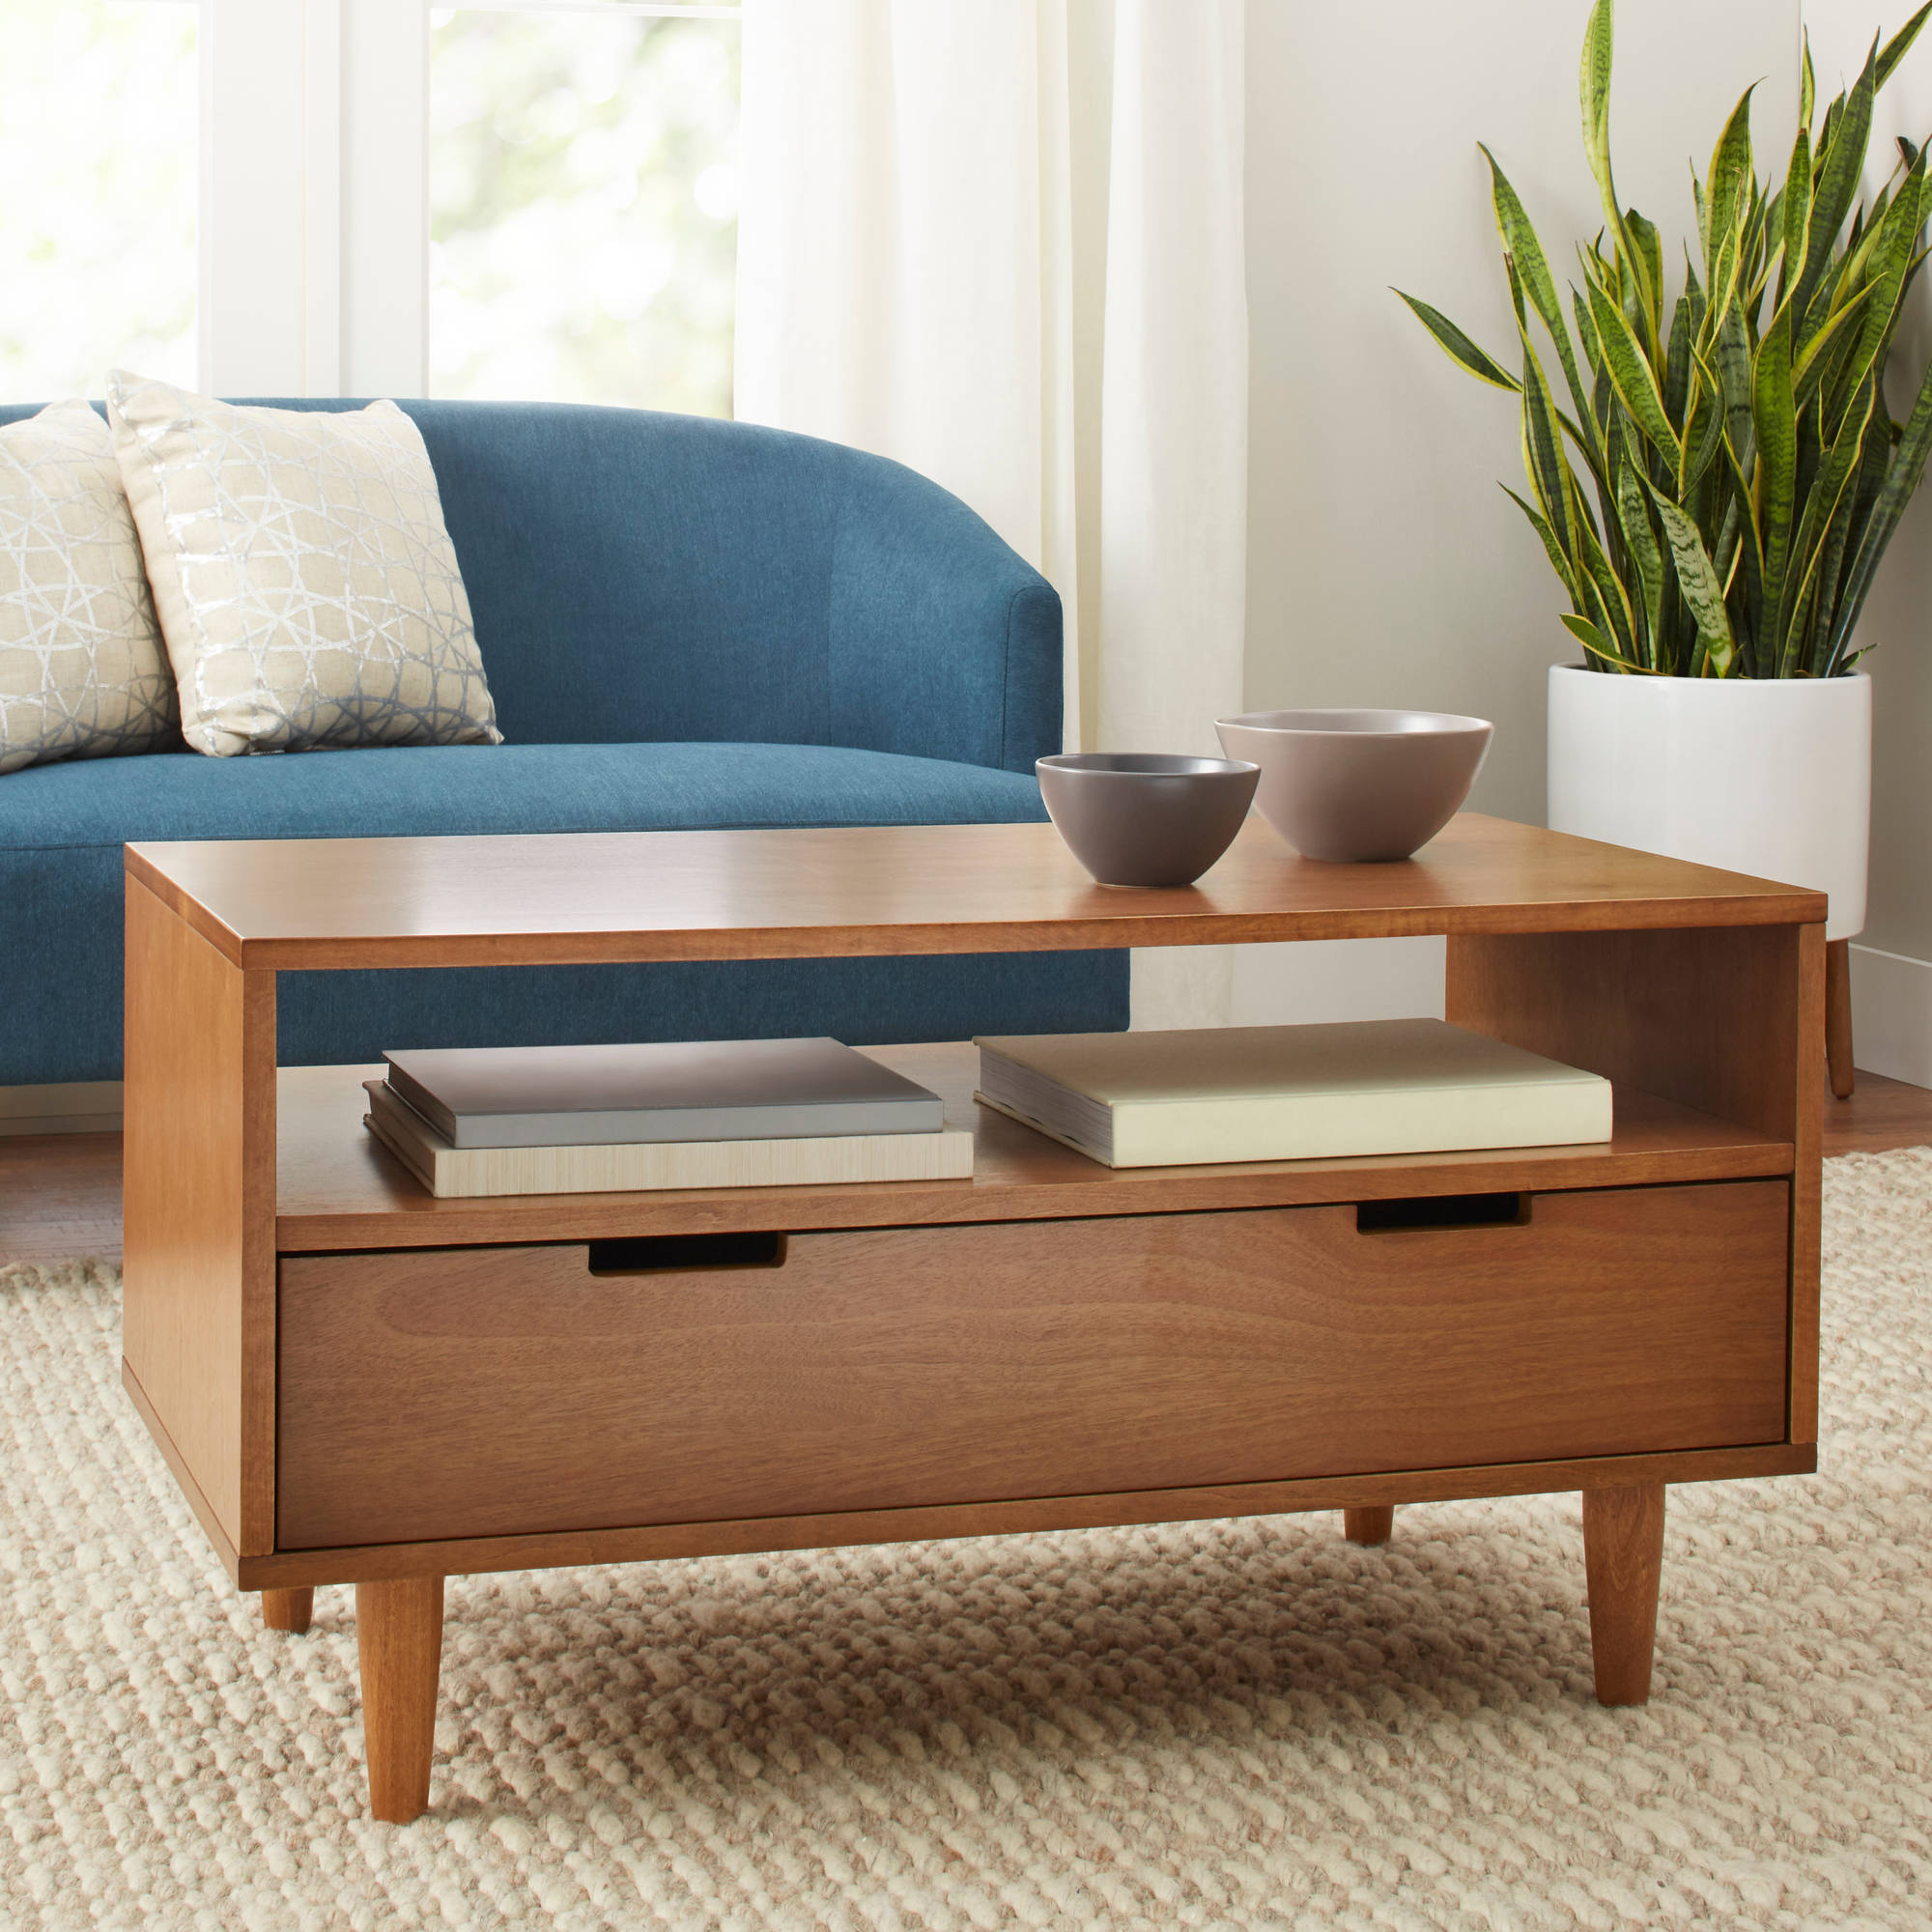 Mid Century Style Coffee Table Solid Wood Legs Storage Shelf Living